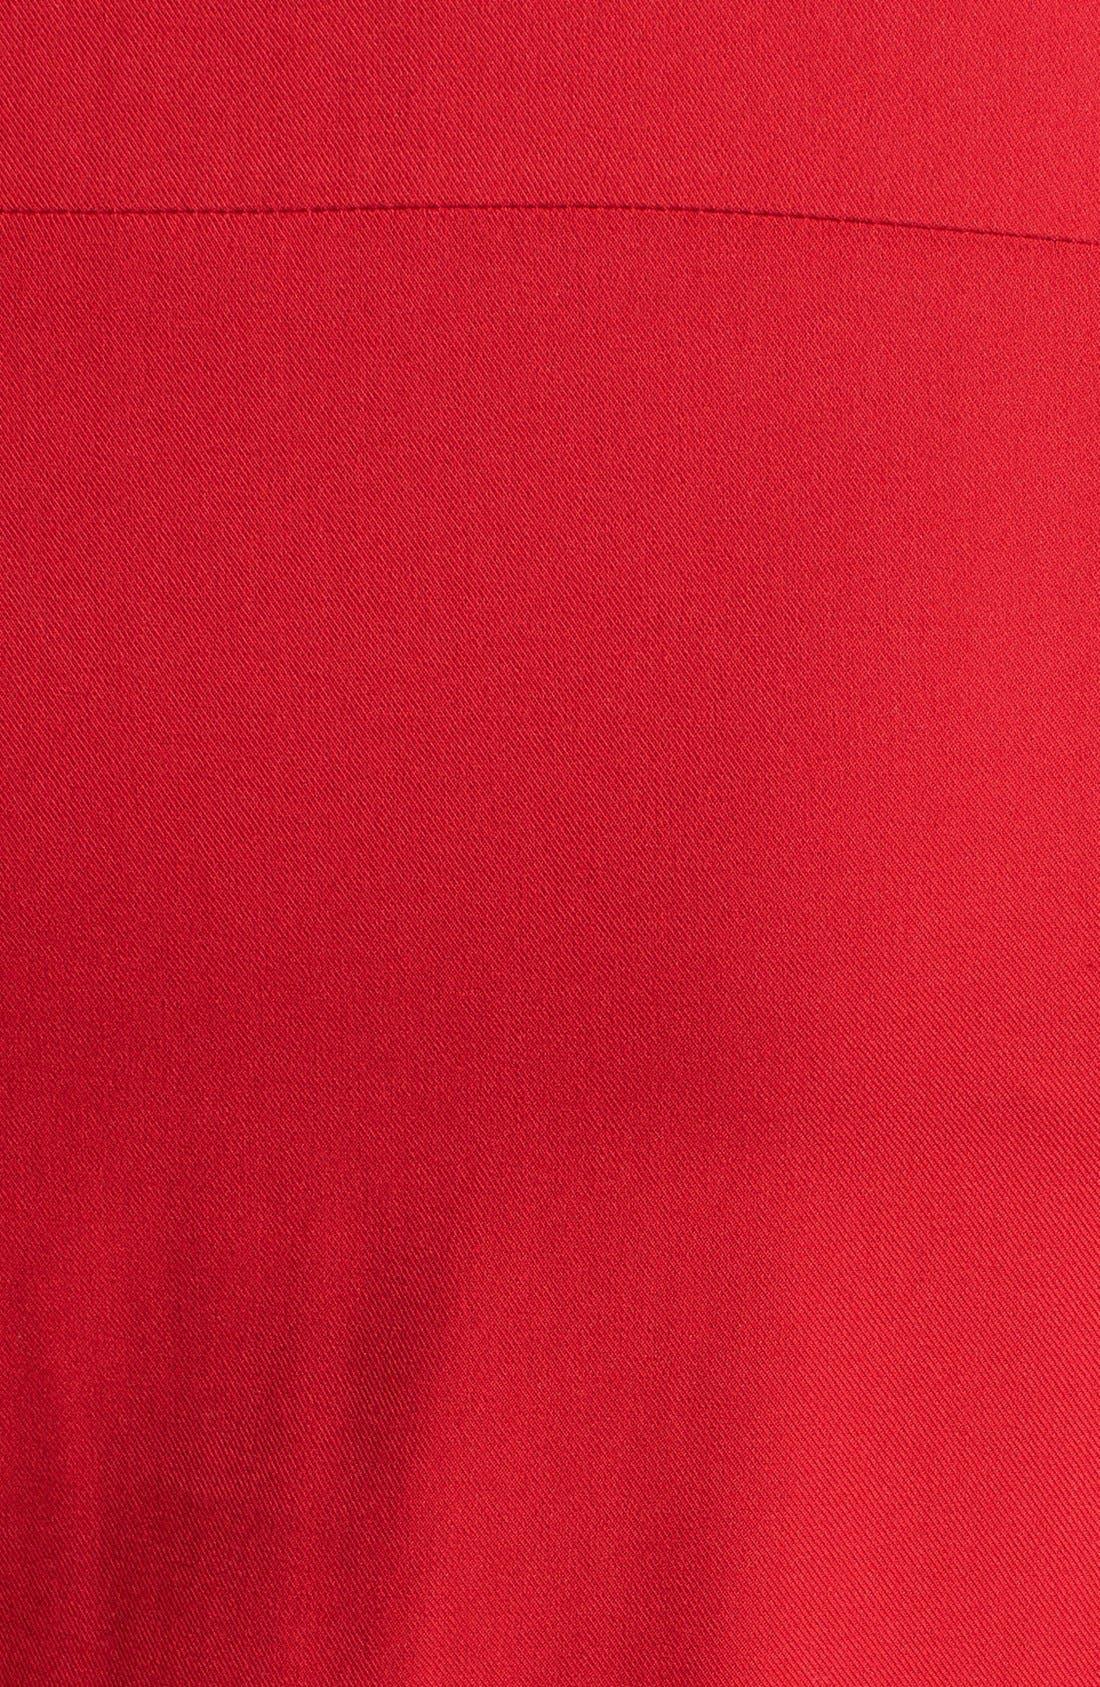 Alternate Image 3  - Evans Twill Pintucked Shirt (Plus Size)